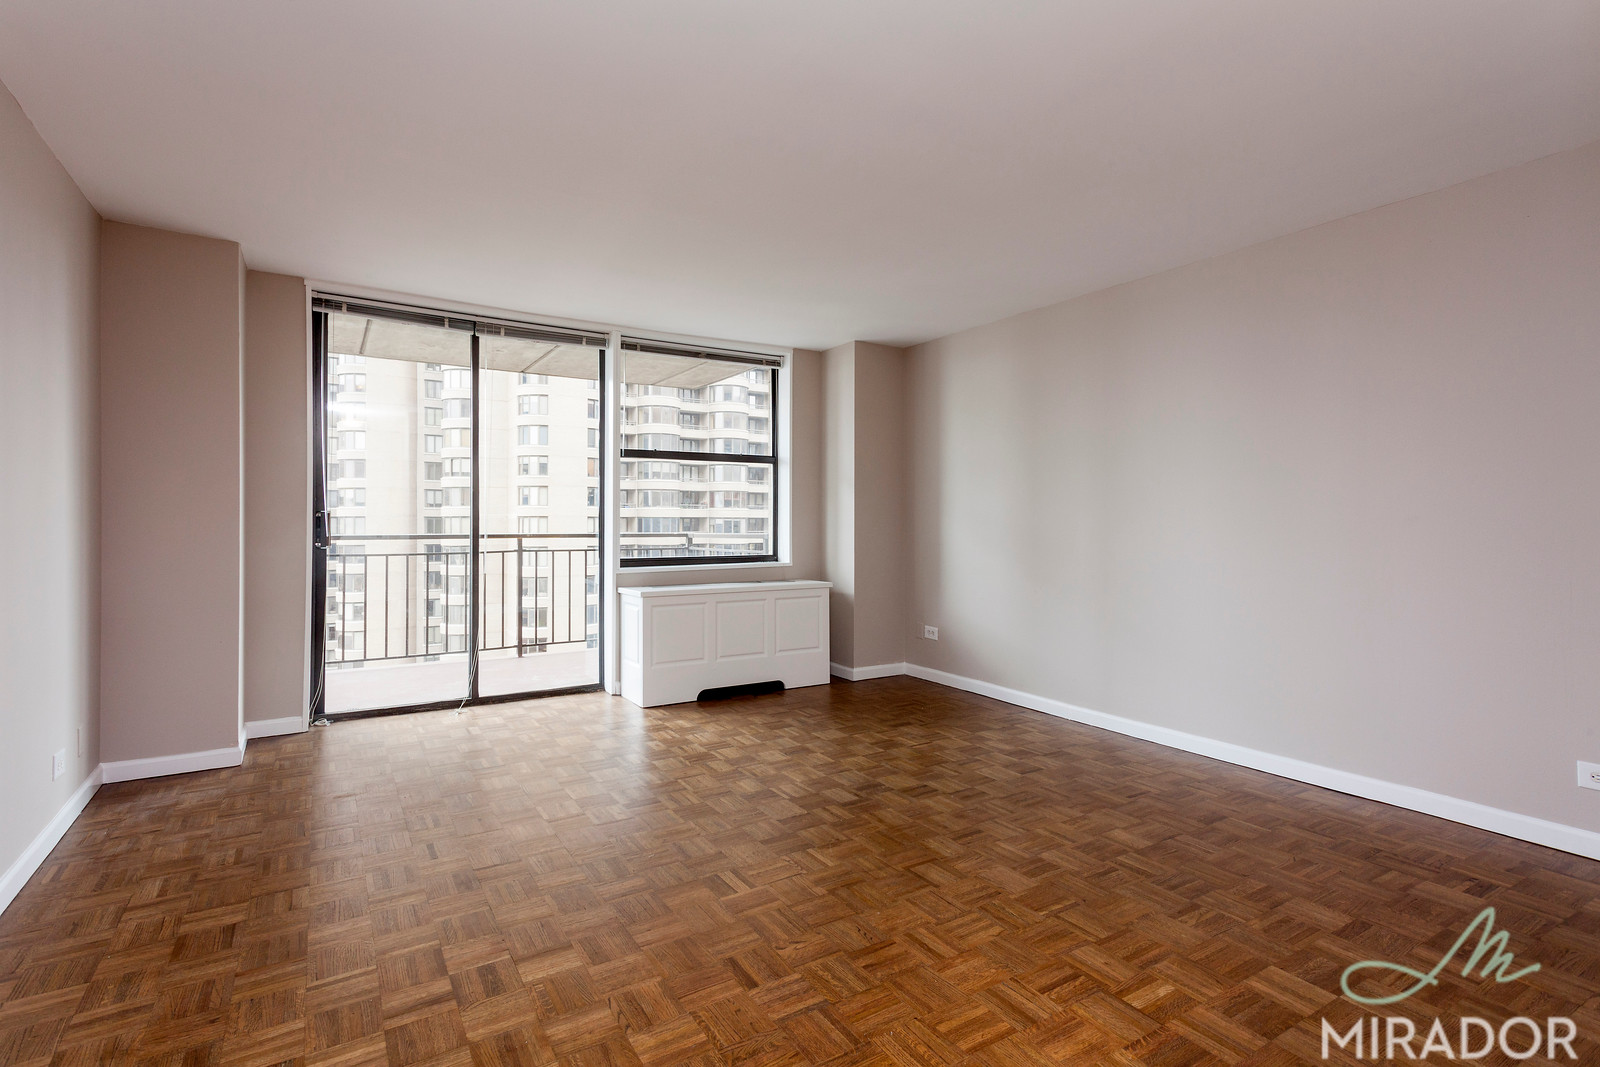 330 East 39th Street, Apt 33R, Manhattan, New York 10016